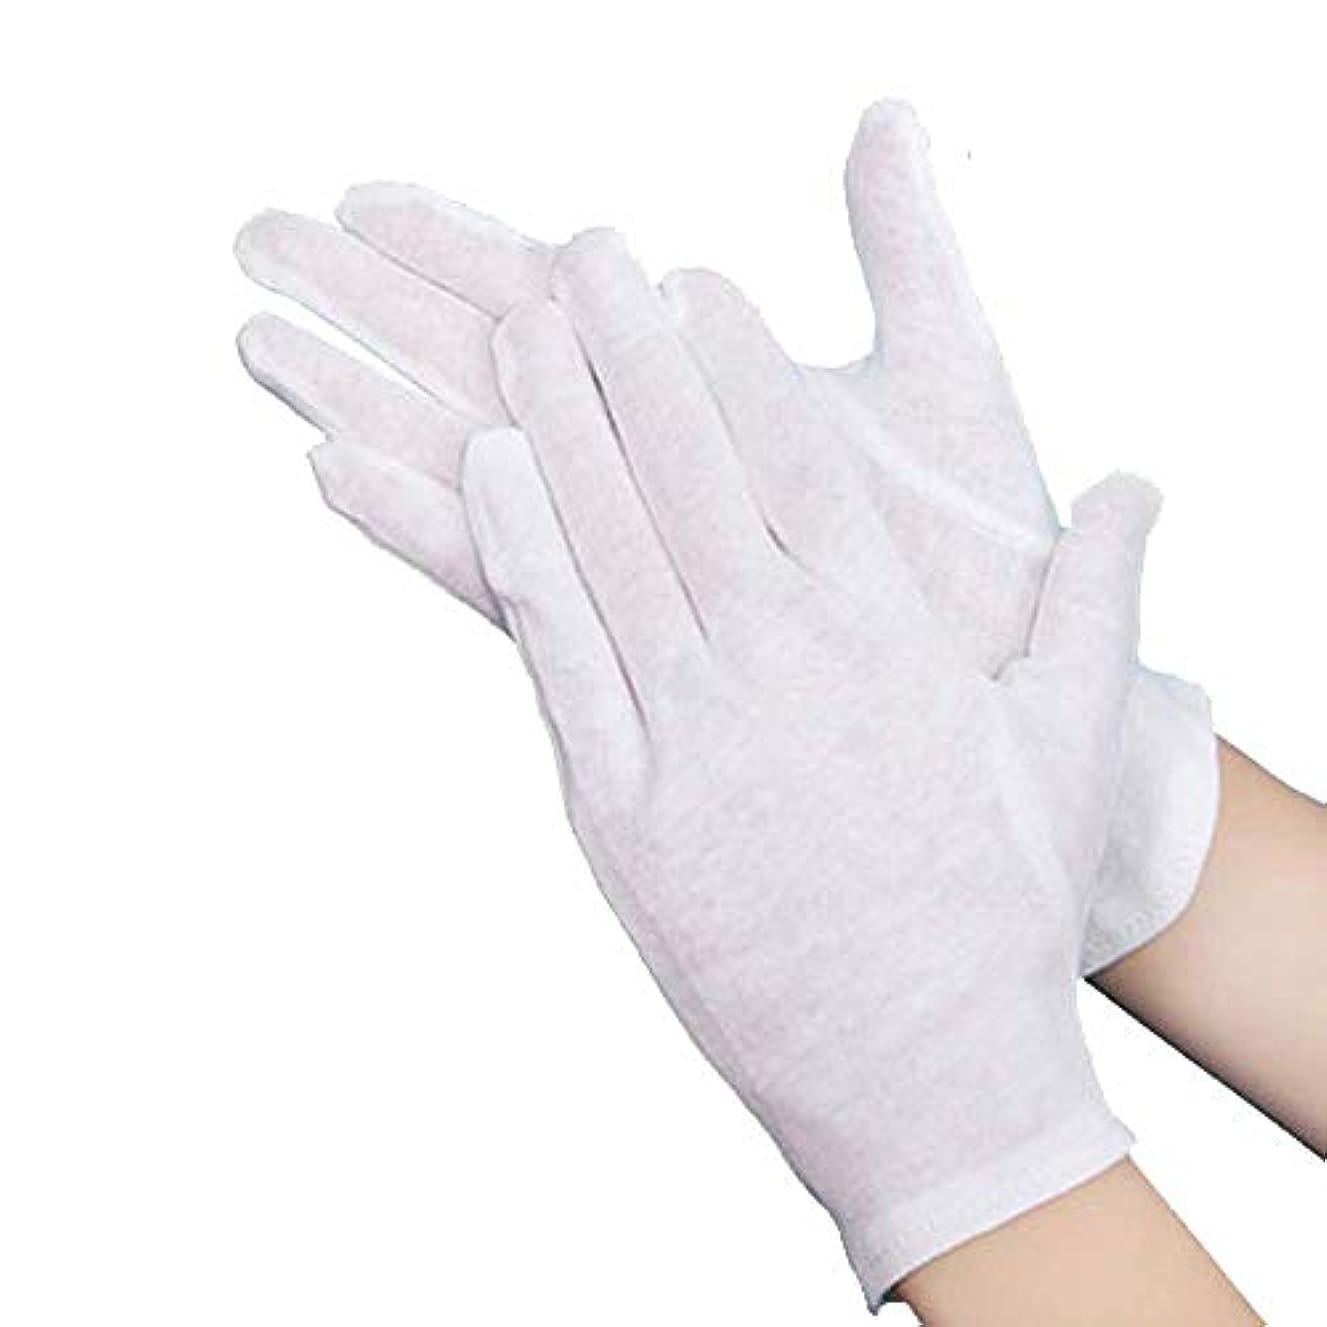 一杯チャンス批判10双組 M トン手袋 綿手袋 通気性